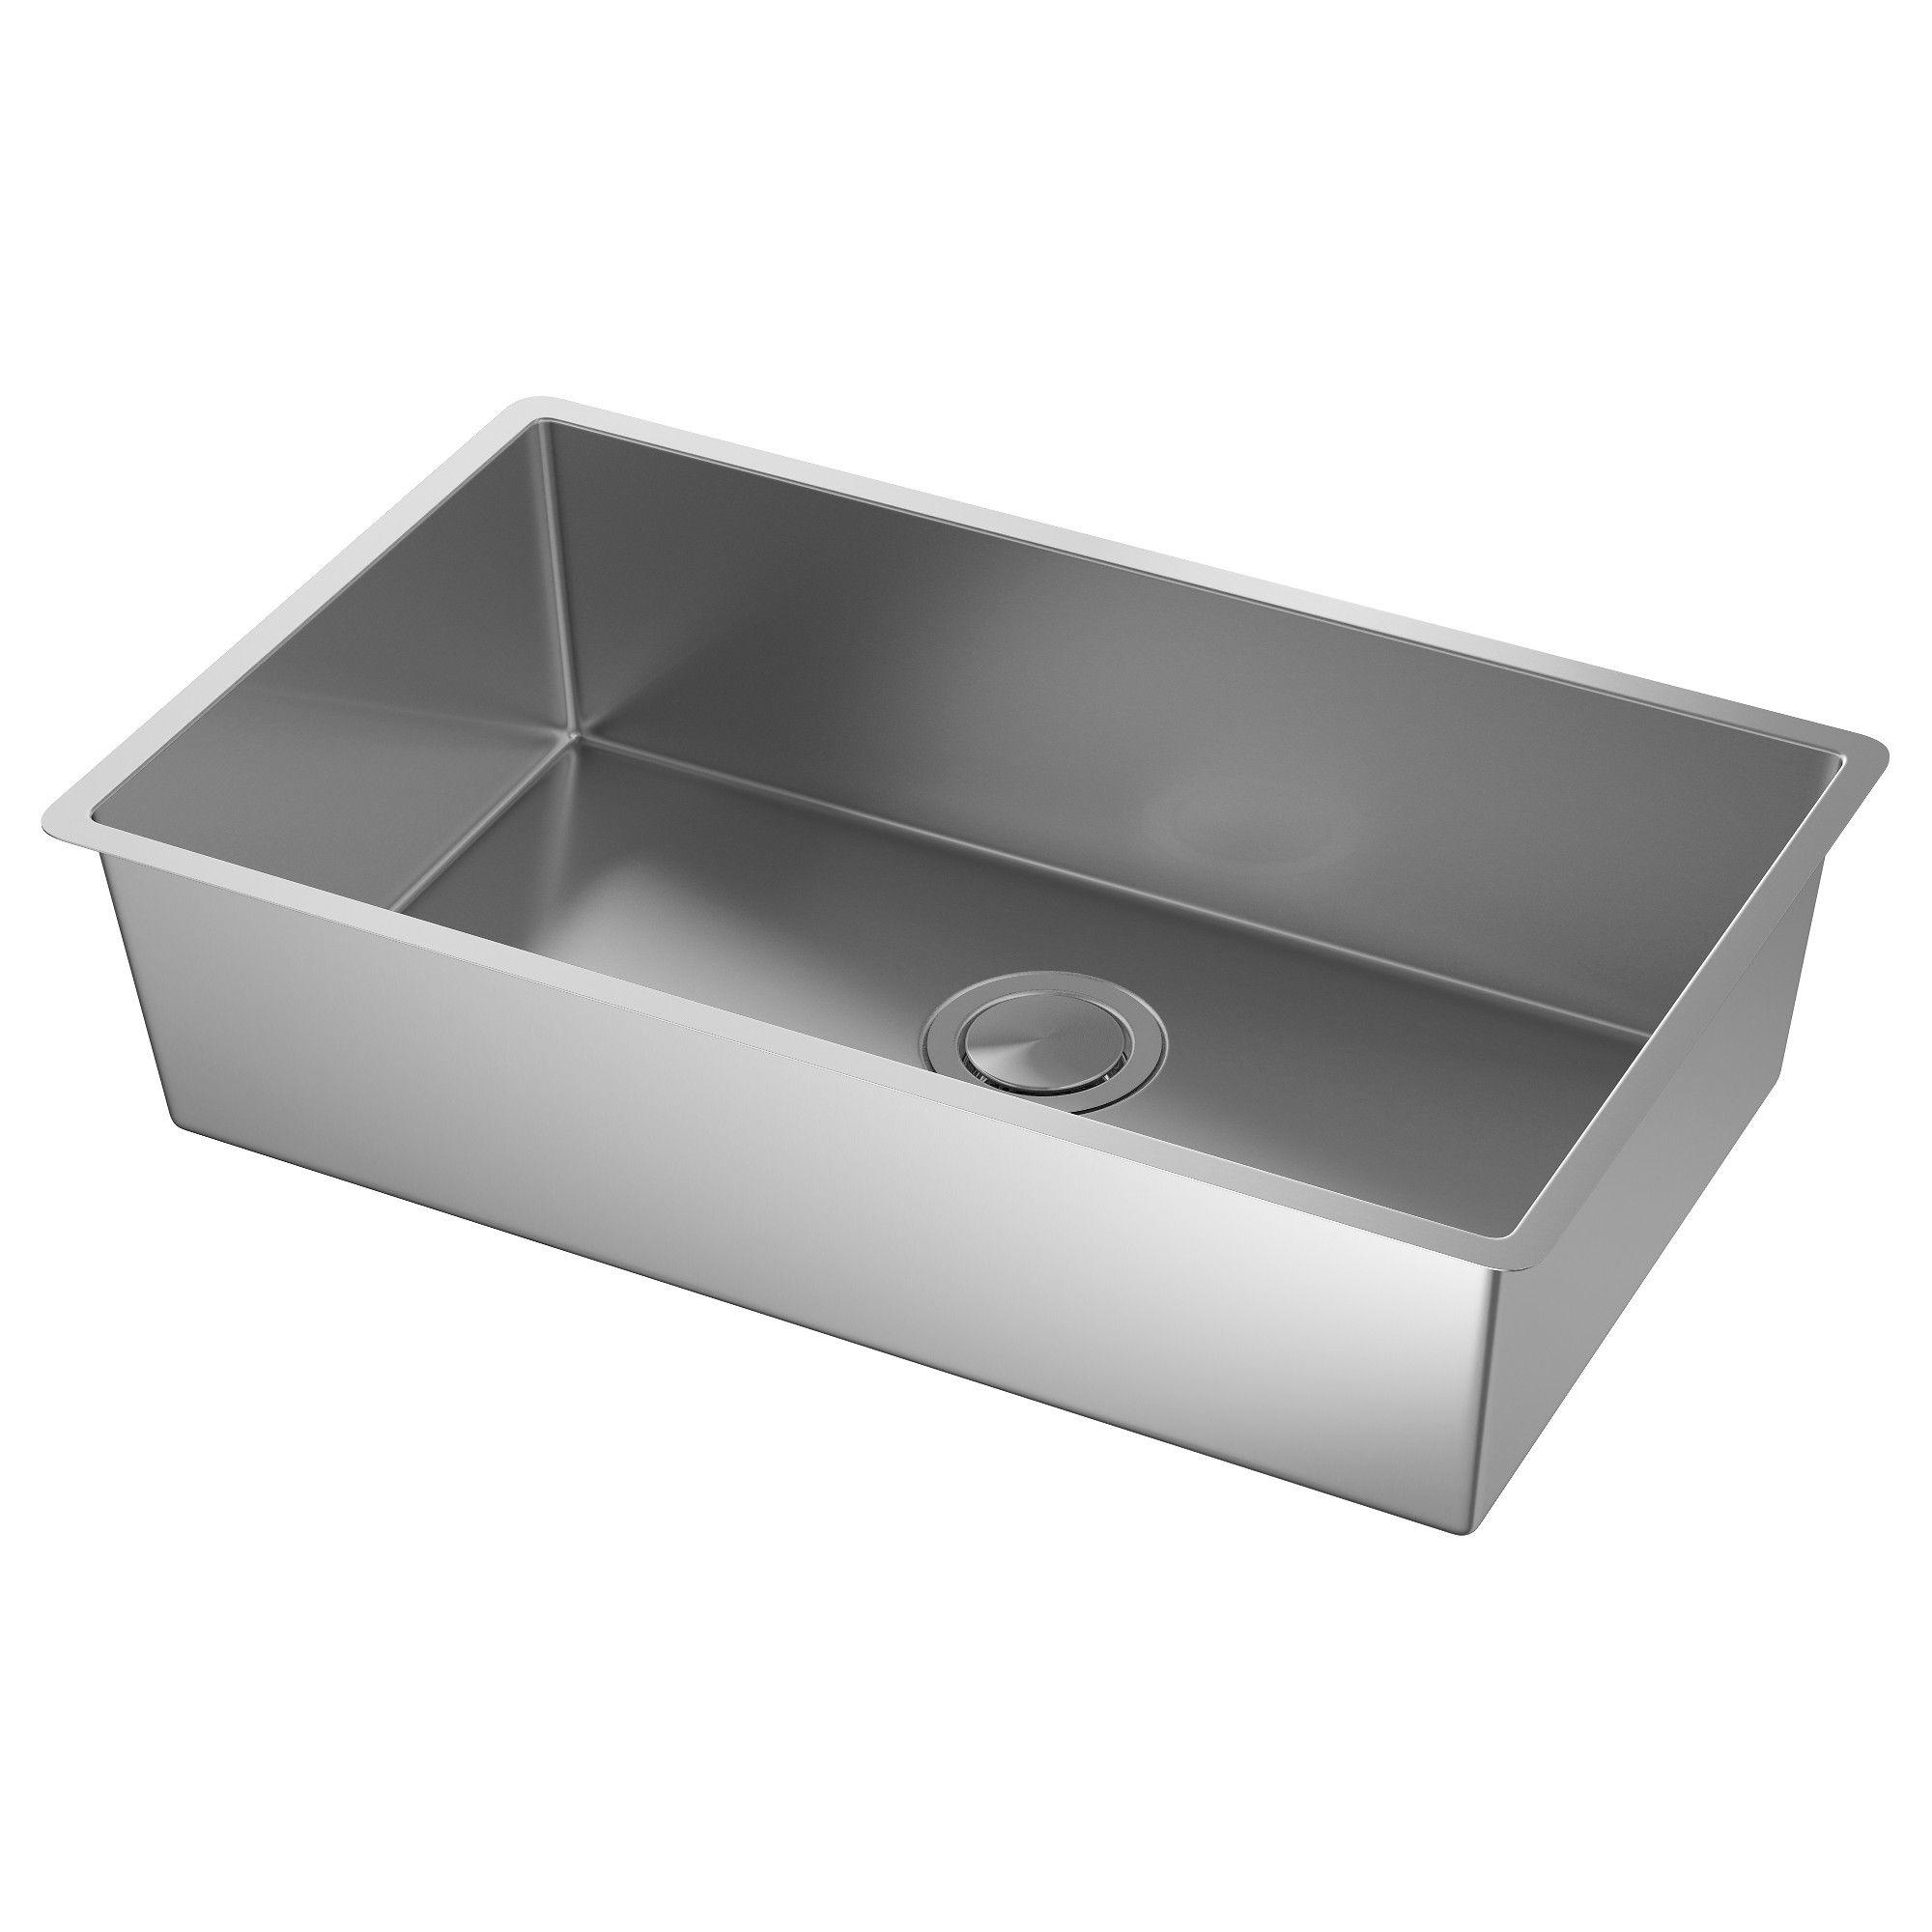 "NORRSJÖN Sink stainless steel 29x17 3/8 "" (74x44 cm"